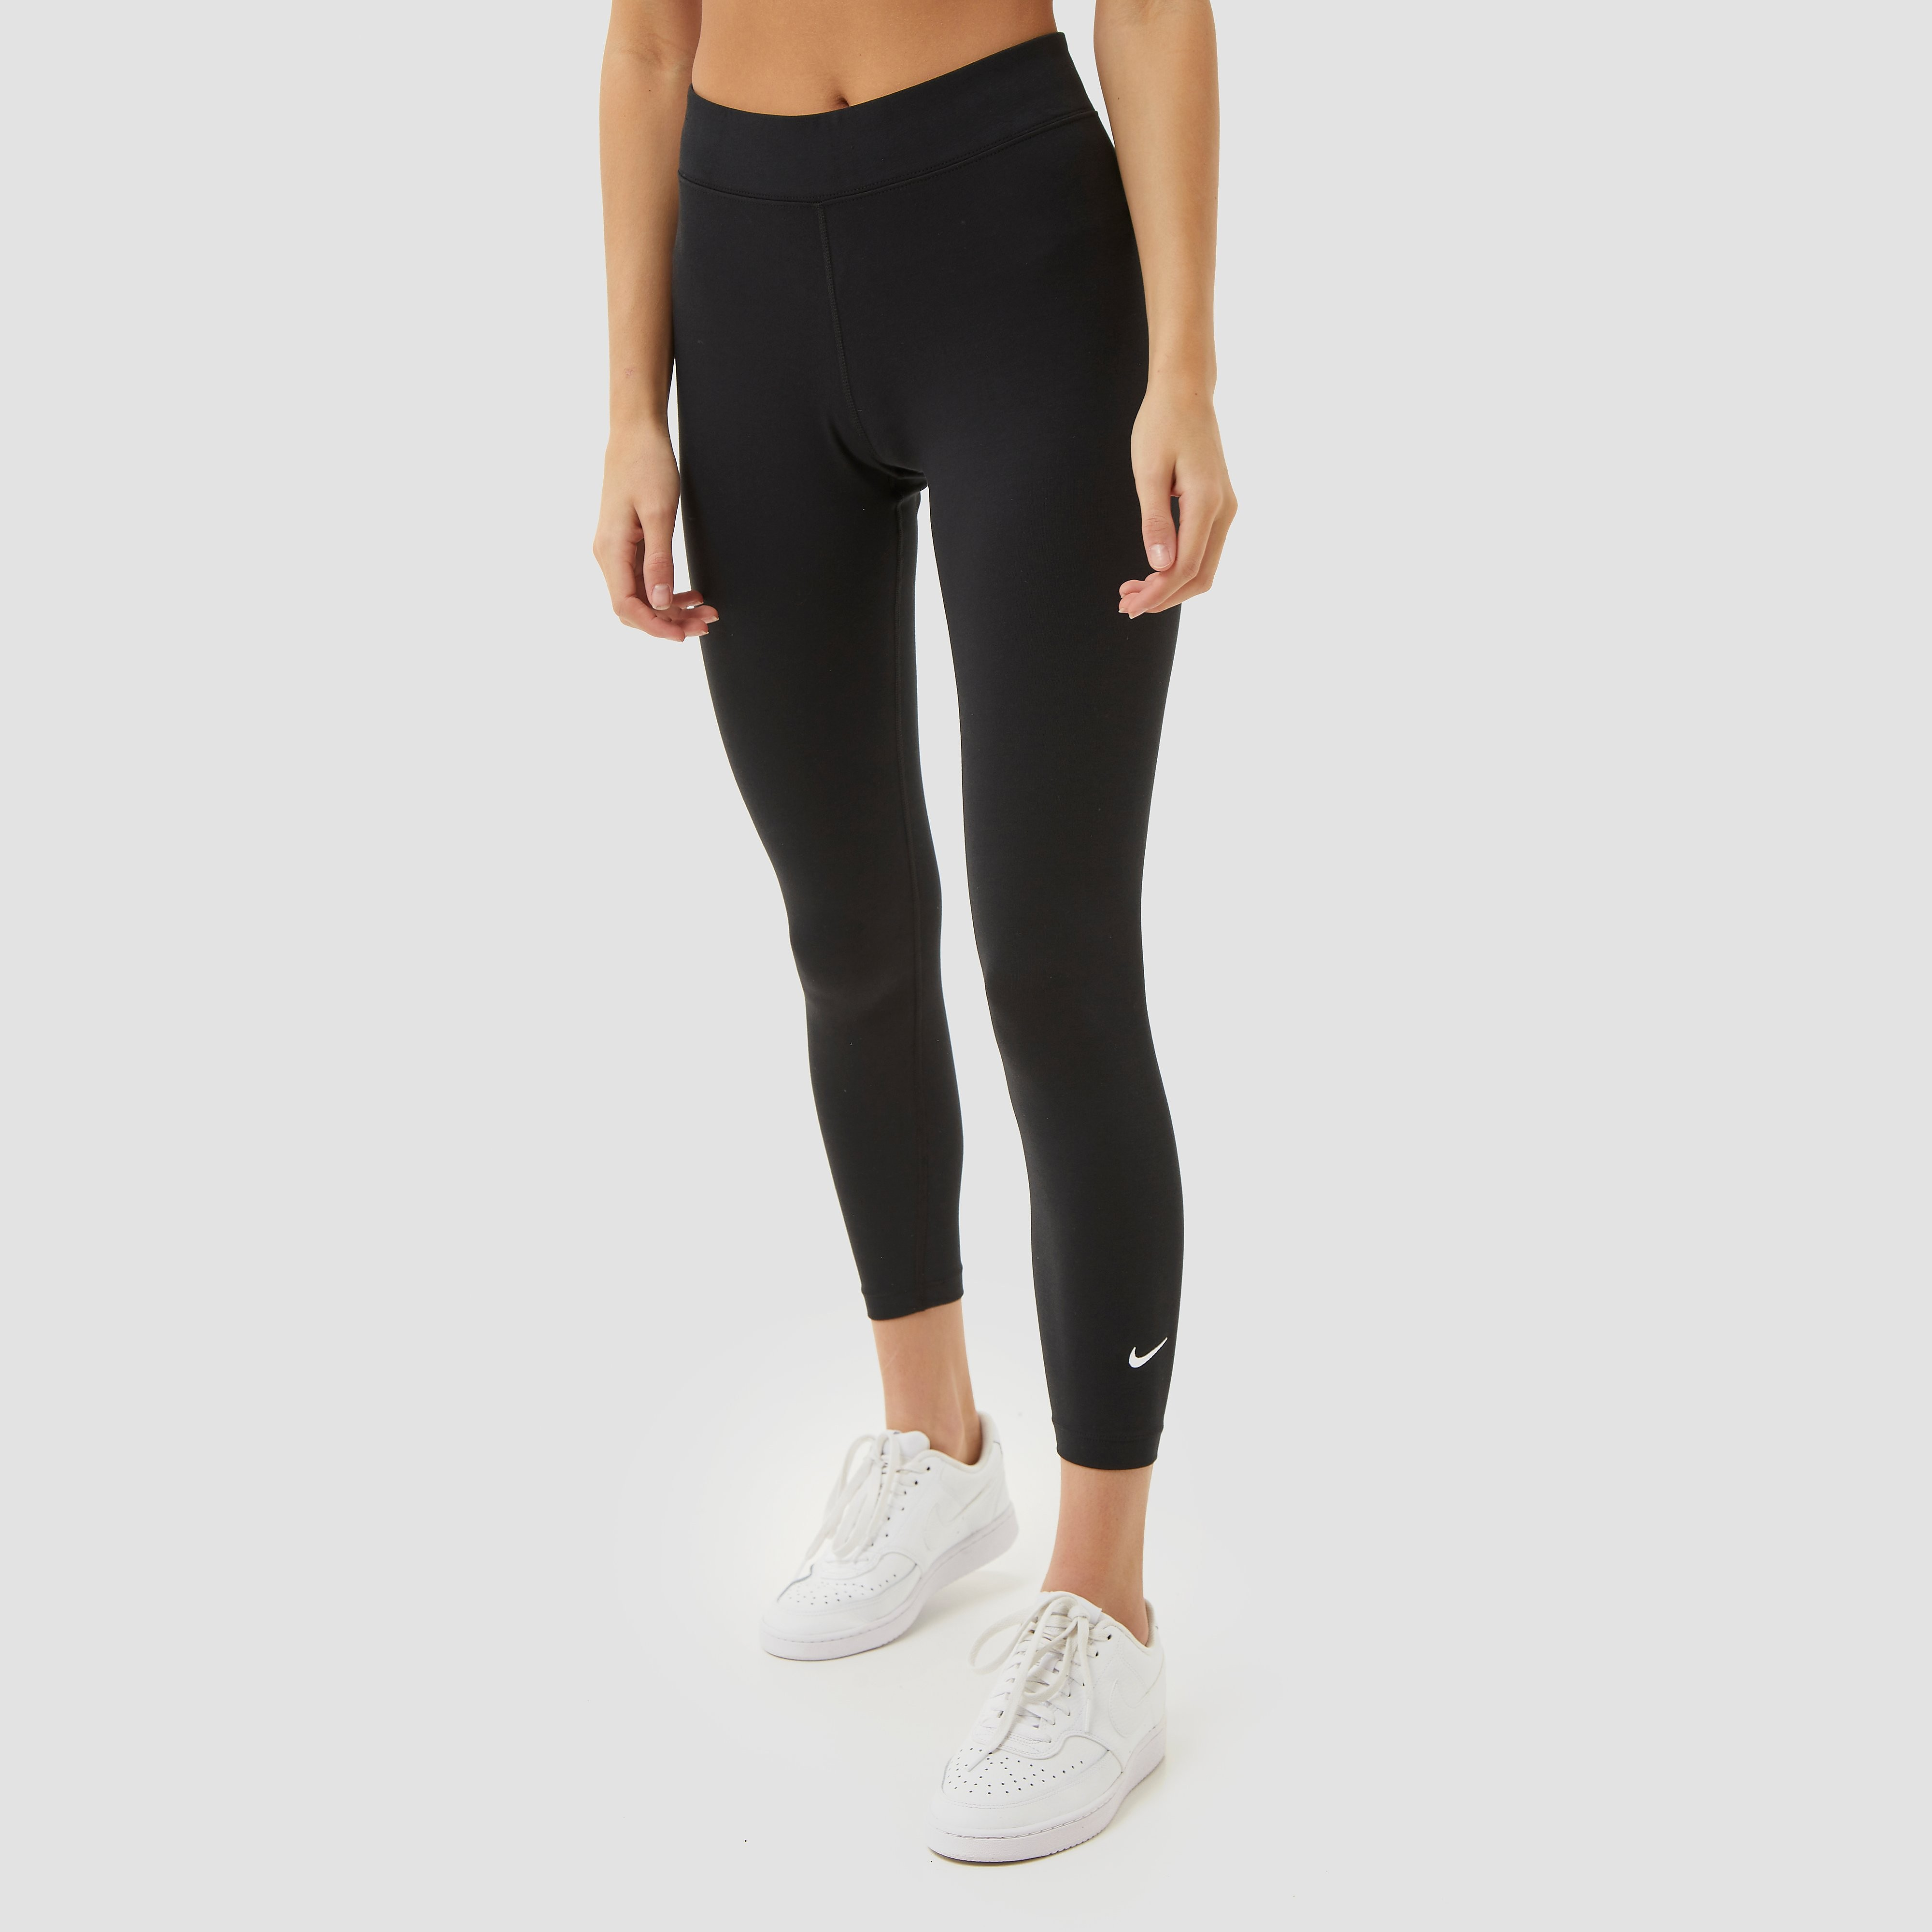 Nike Nike sportswear essential 7/8 mid-rise tight zwart dames dames